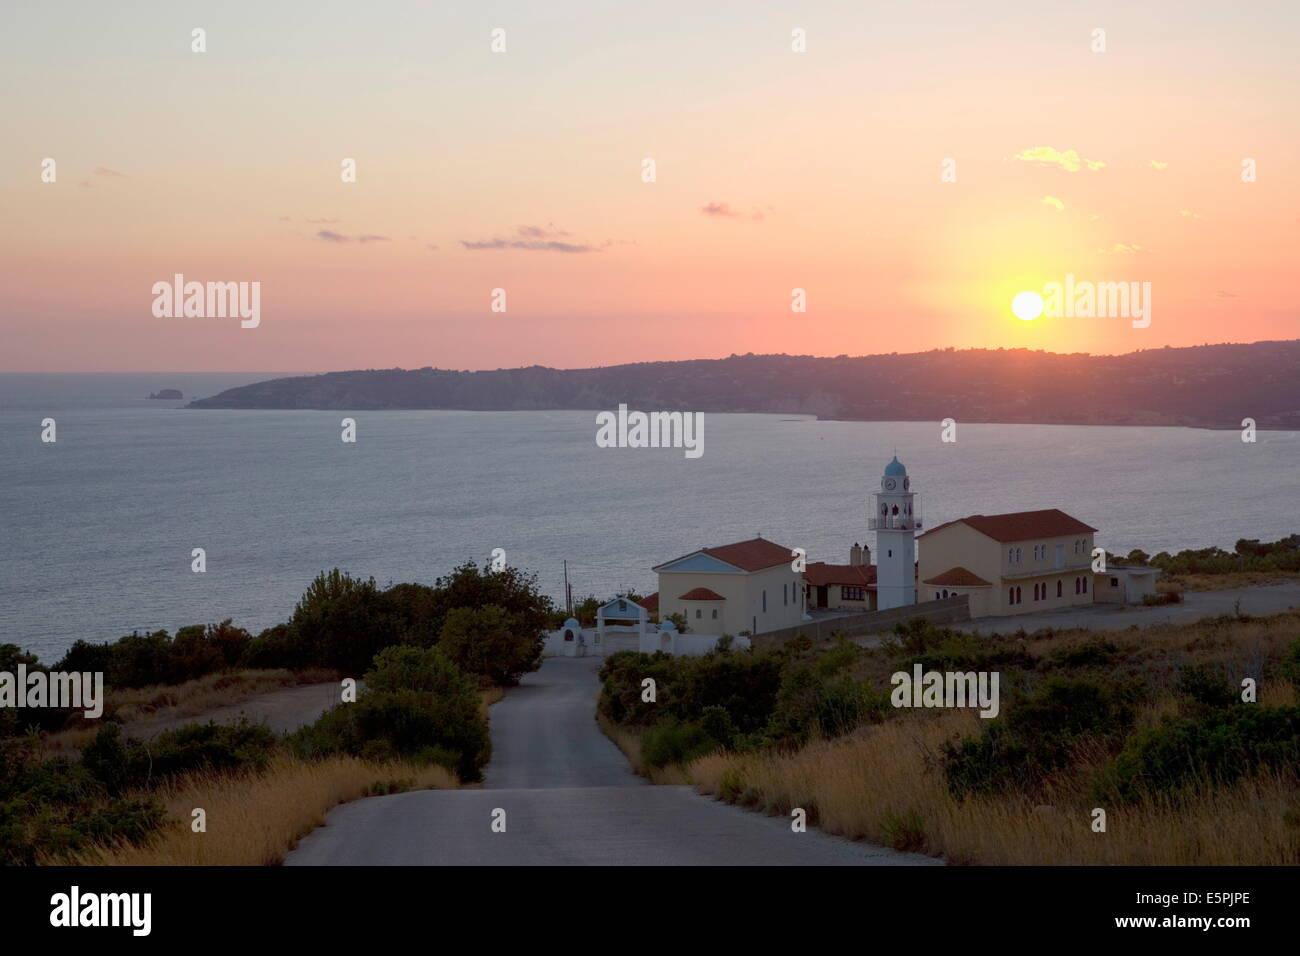 Sunset over Lourdata Bay, near Lourdata, Kefalonia (Kefallonia, Cephalonia), Ionian Islands, Greek Islands, Greece - Stock Image